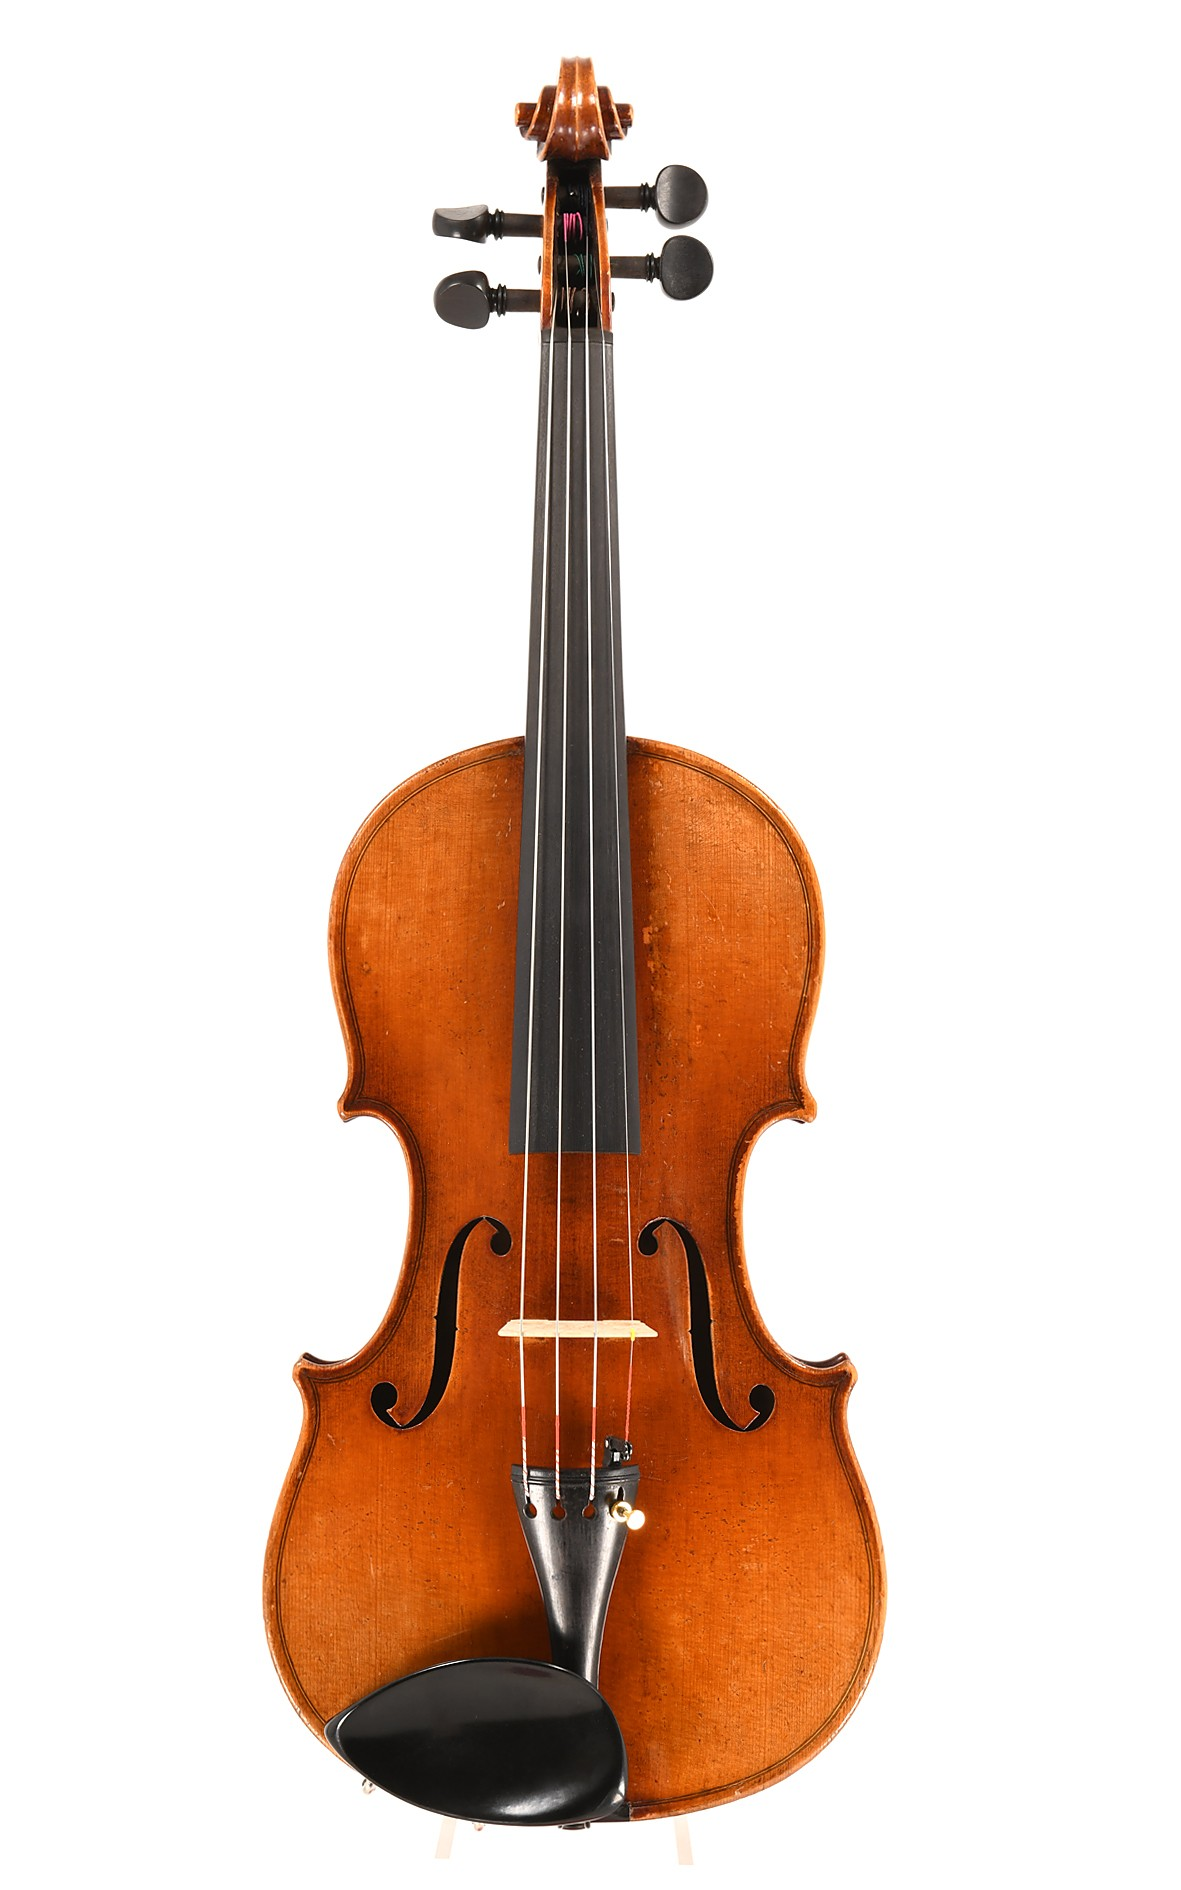 Markneukirchen violin, soloist violin - table